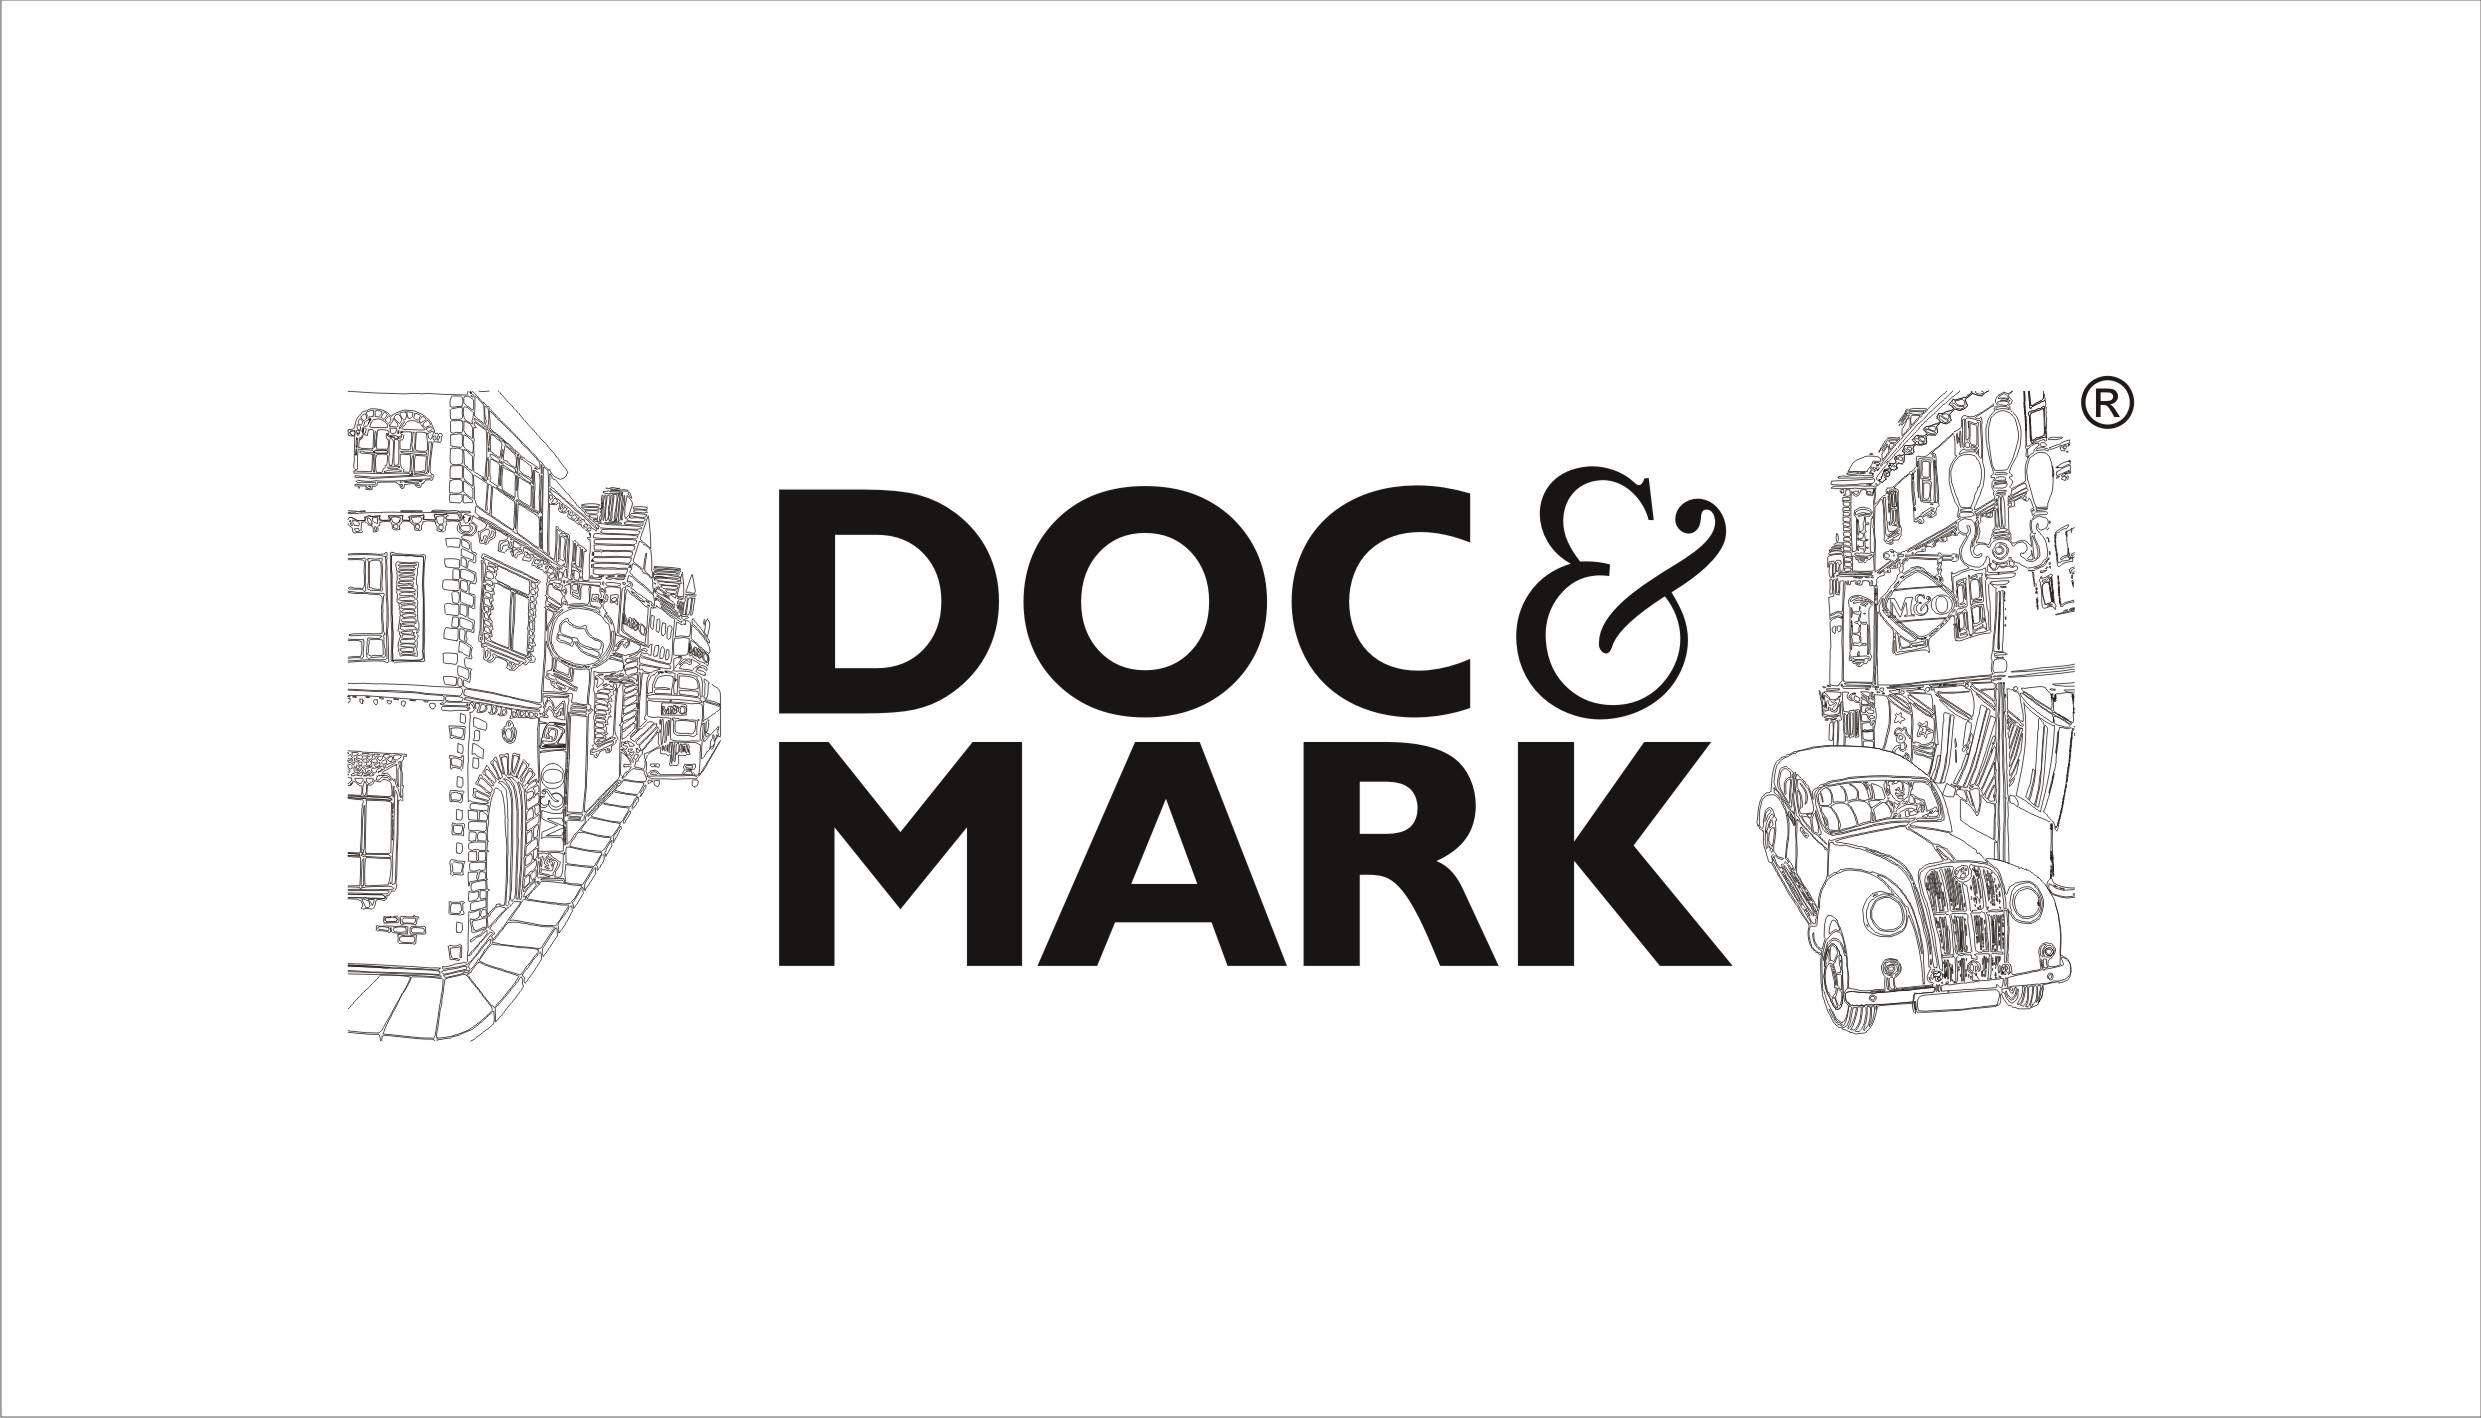 DOC & MARK